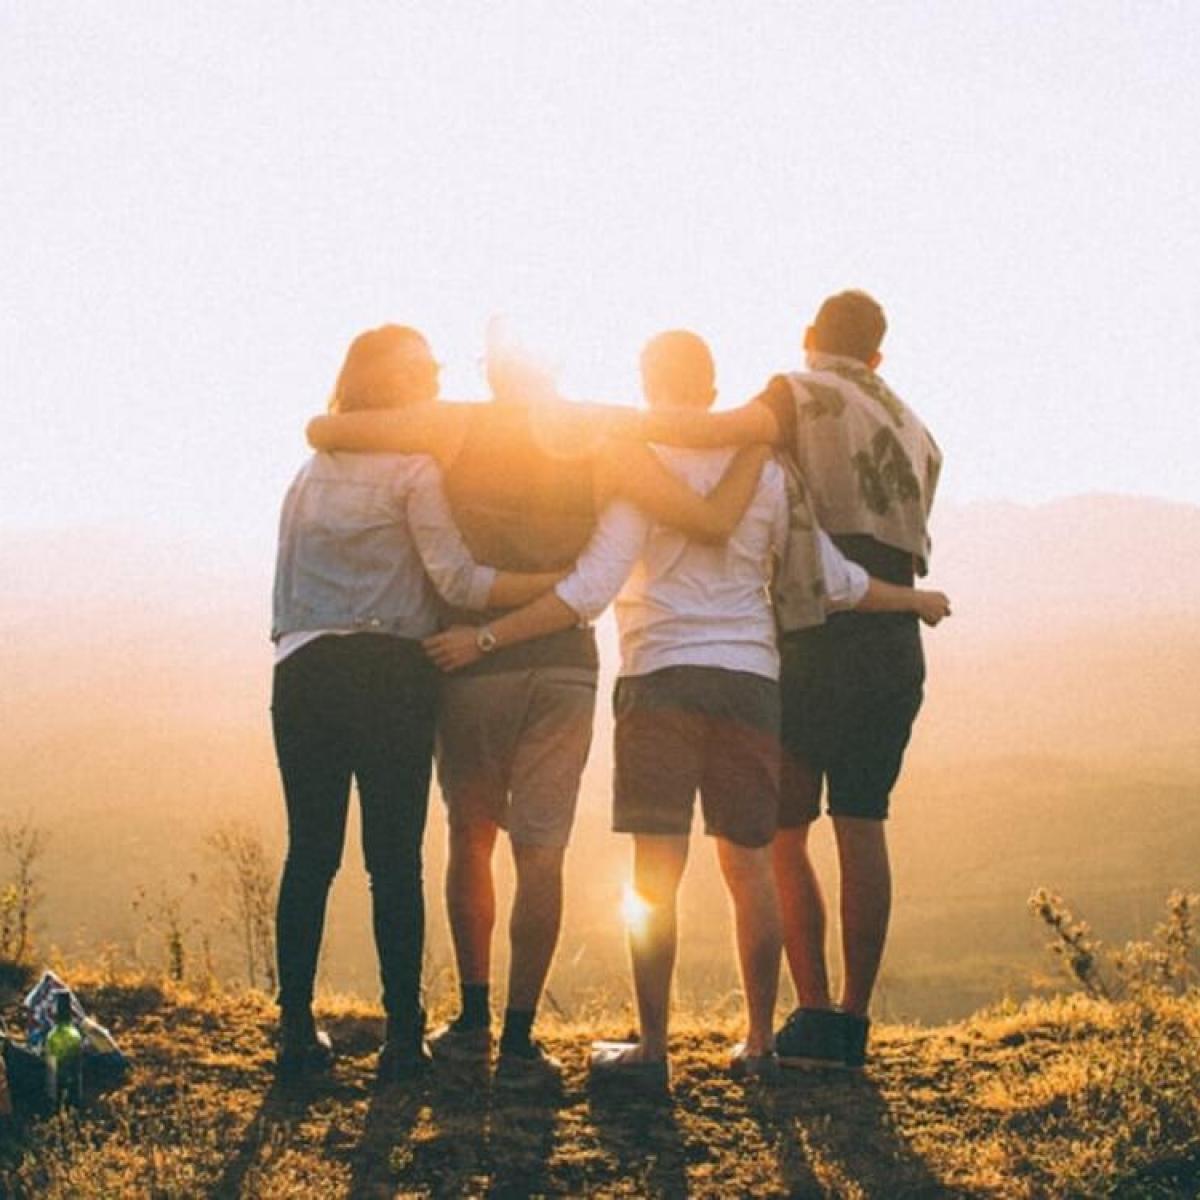 Friendship Day 2020: From 3 Idiots to Zindagi Na Milegi Dobara, best movies on friendship to binge watch